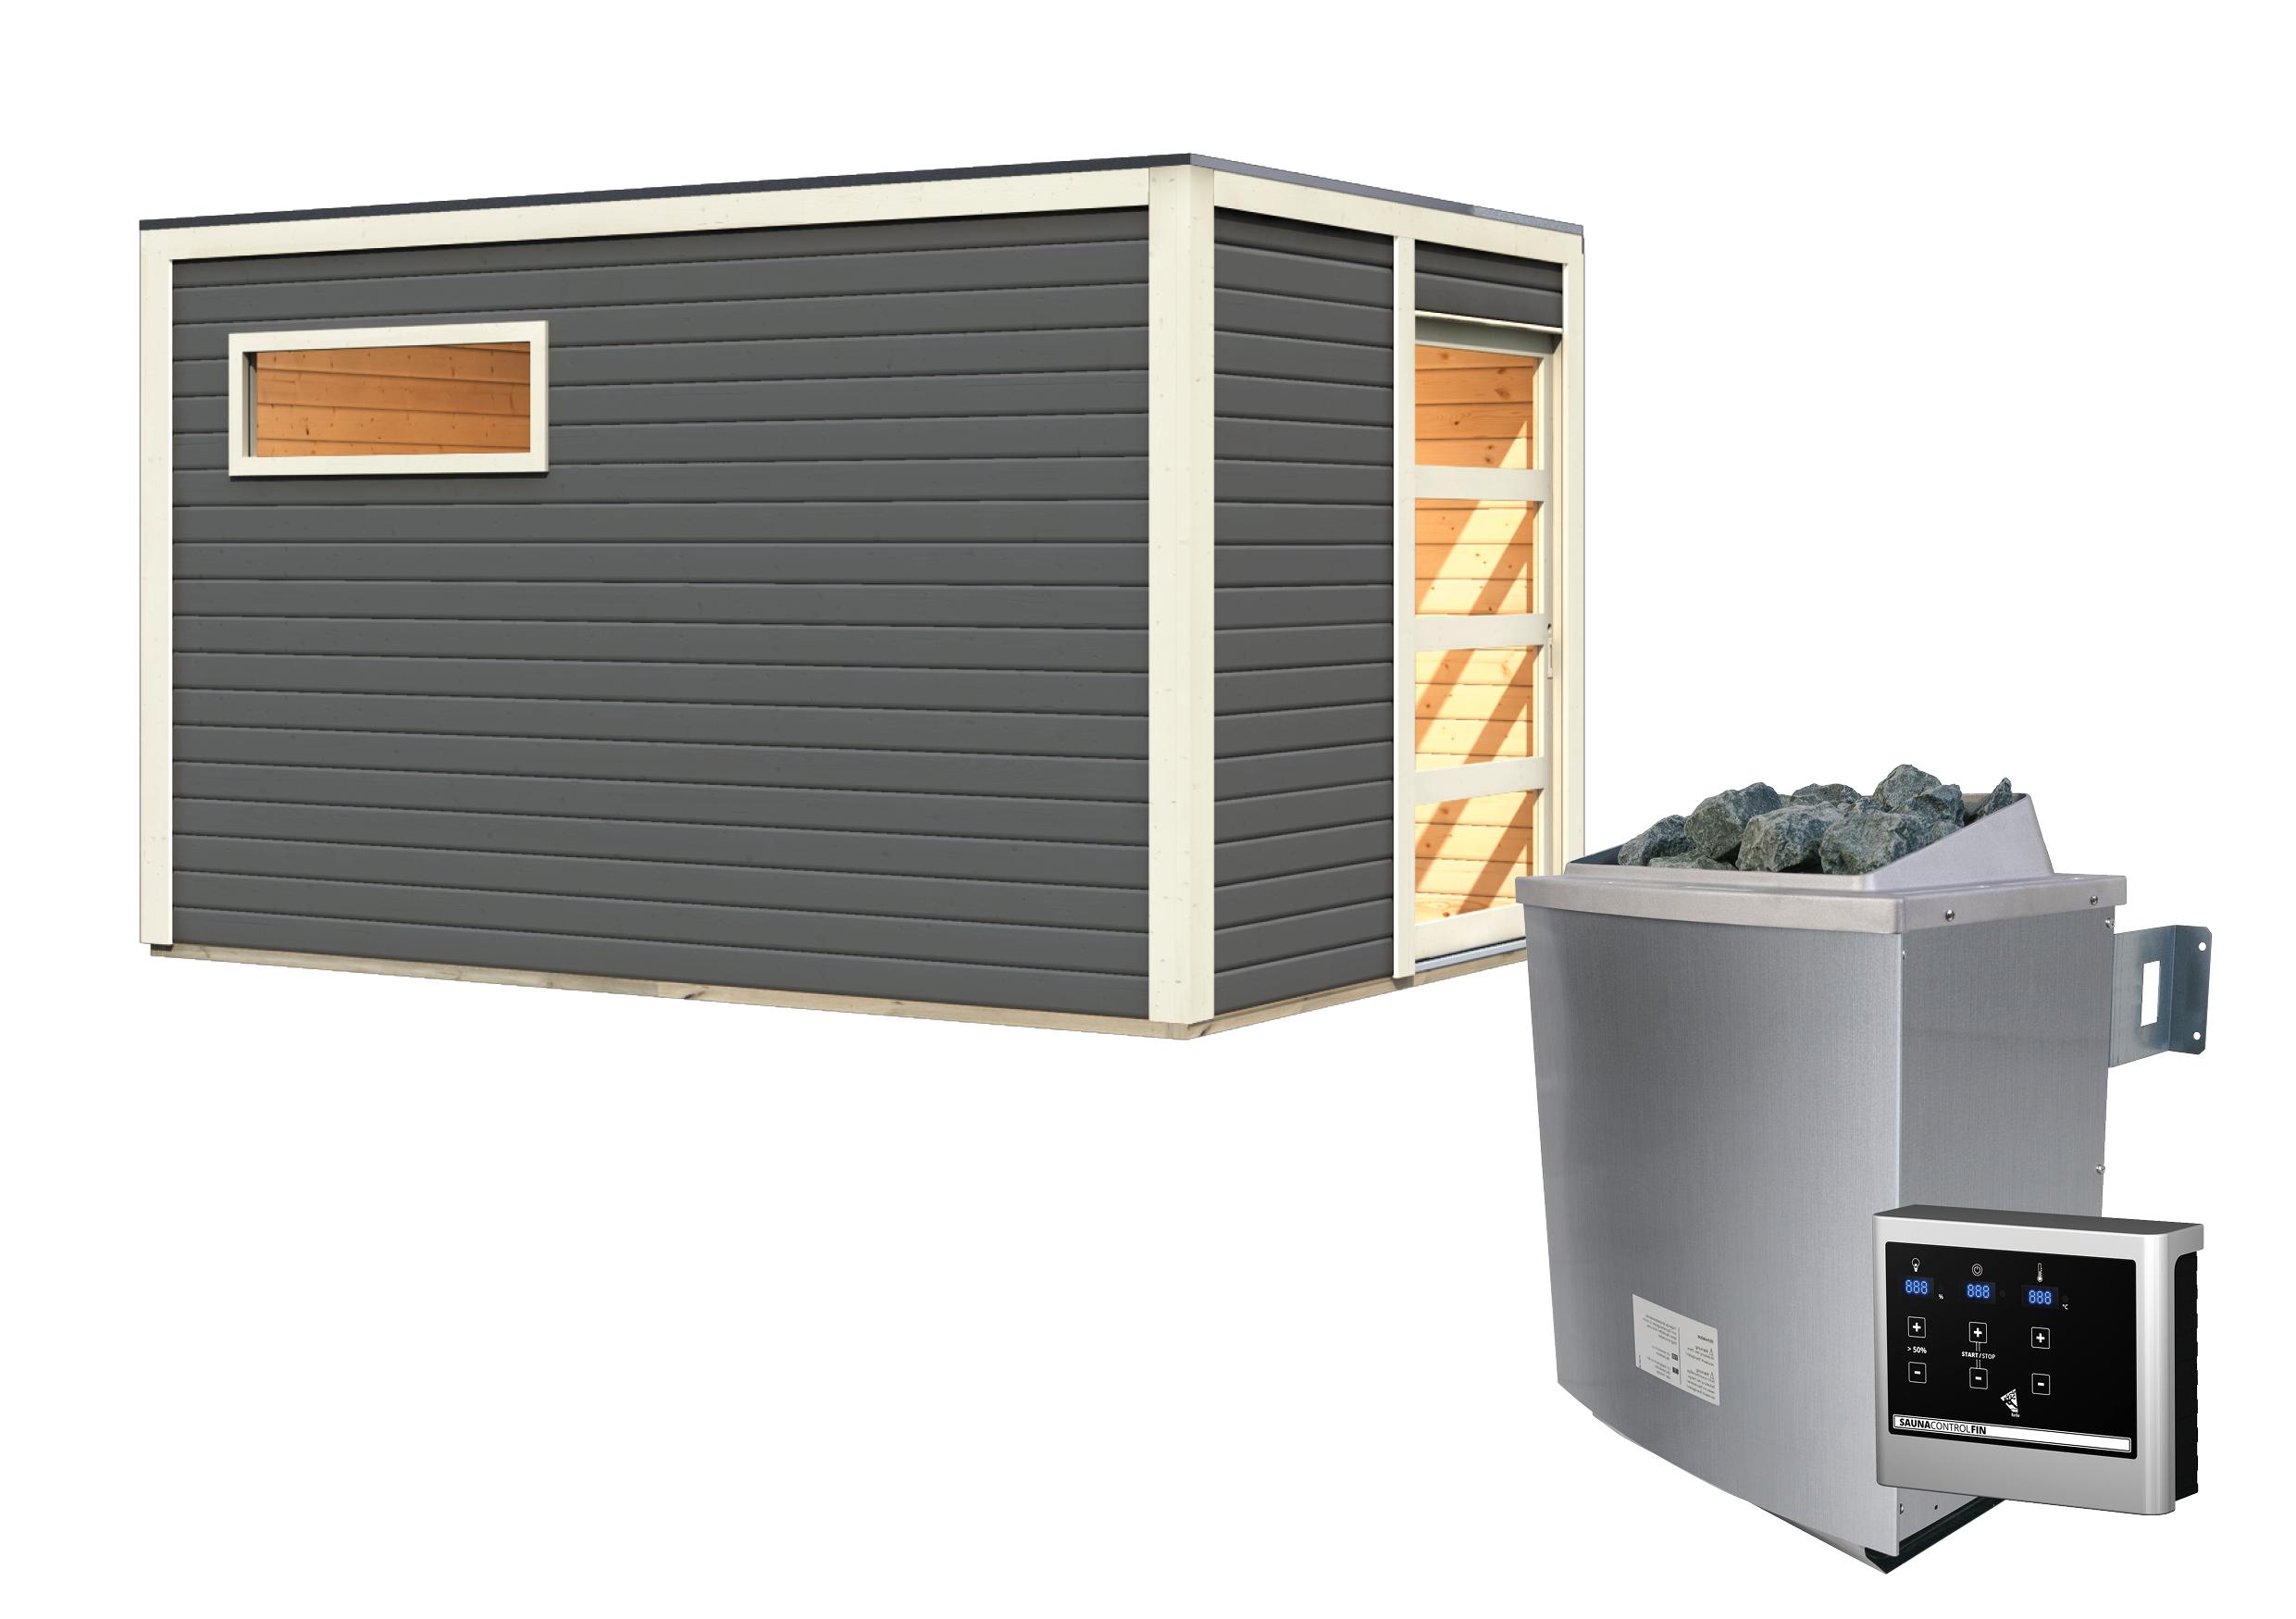 Gartensauna Karibu Saunahaus Caleb grau 38mm Saunaofen 9kW extern Bild 12